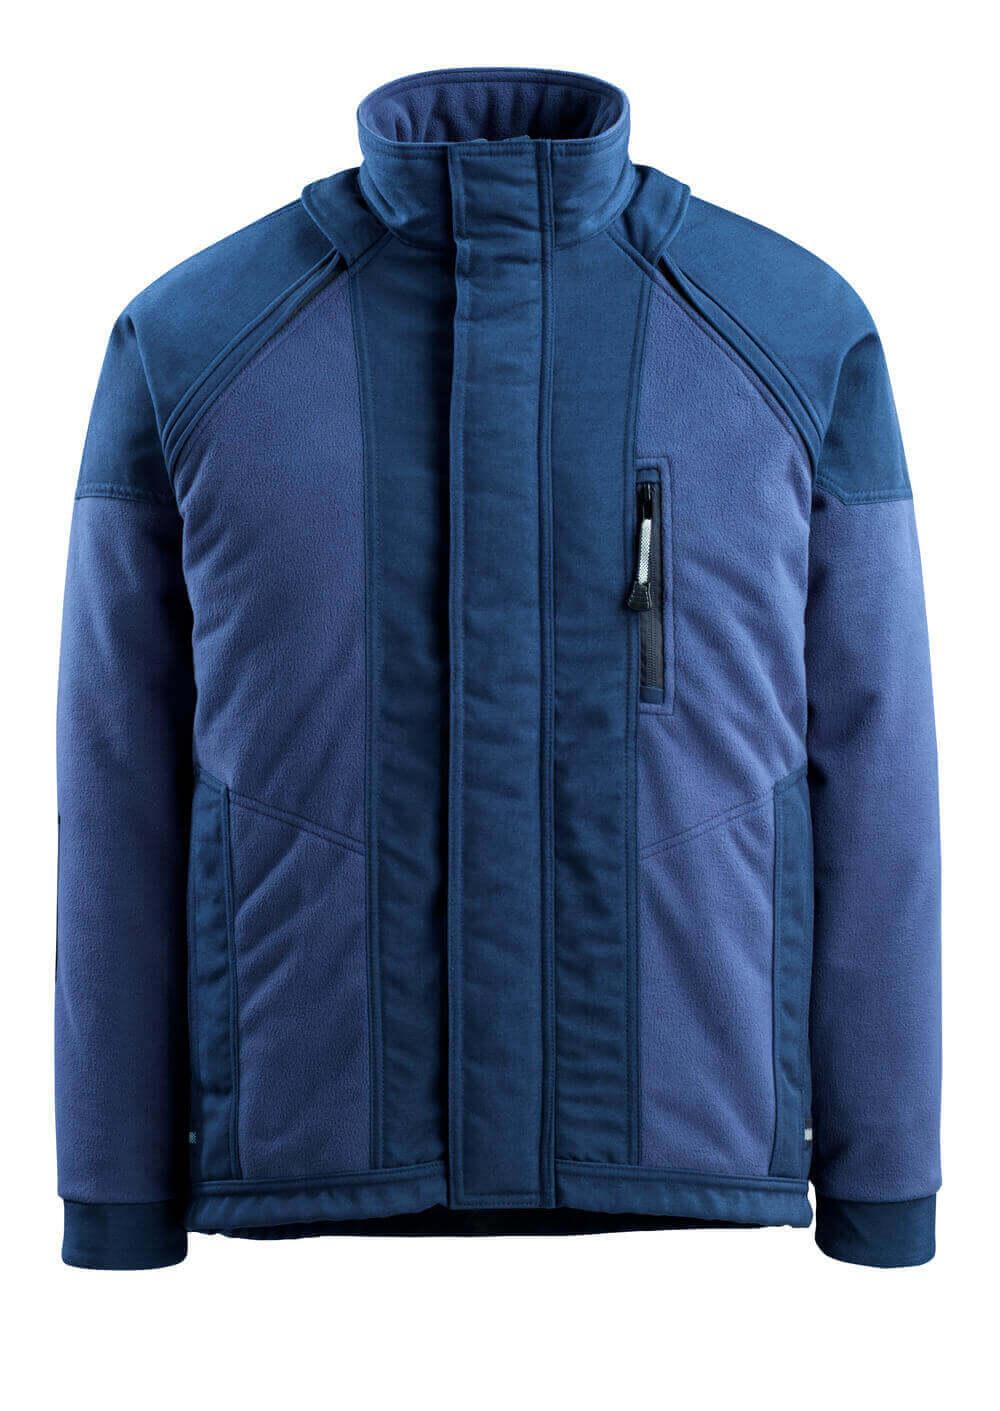 06142-147-01 Chaqueta polar - azul marino